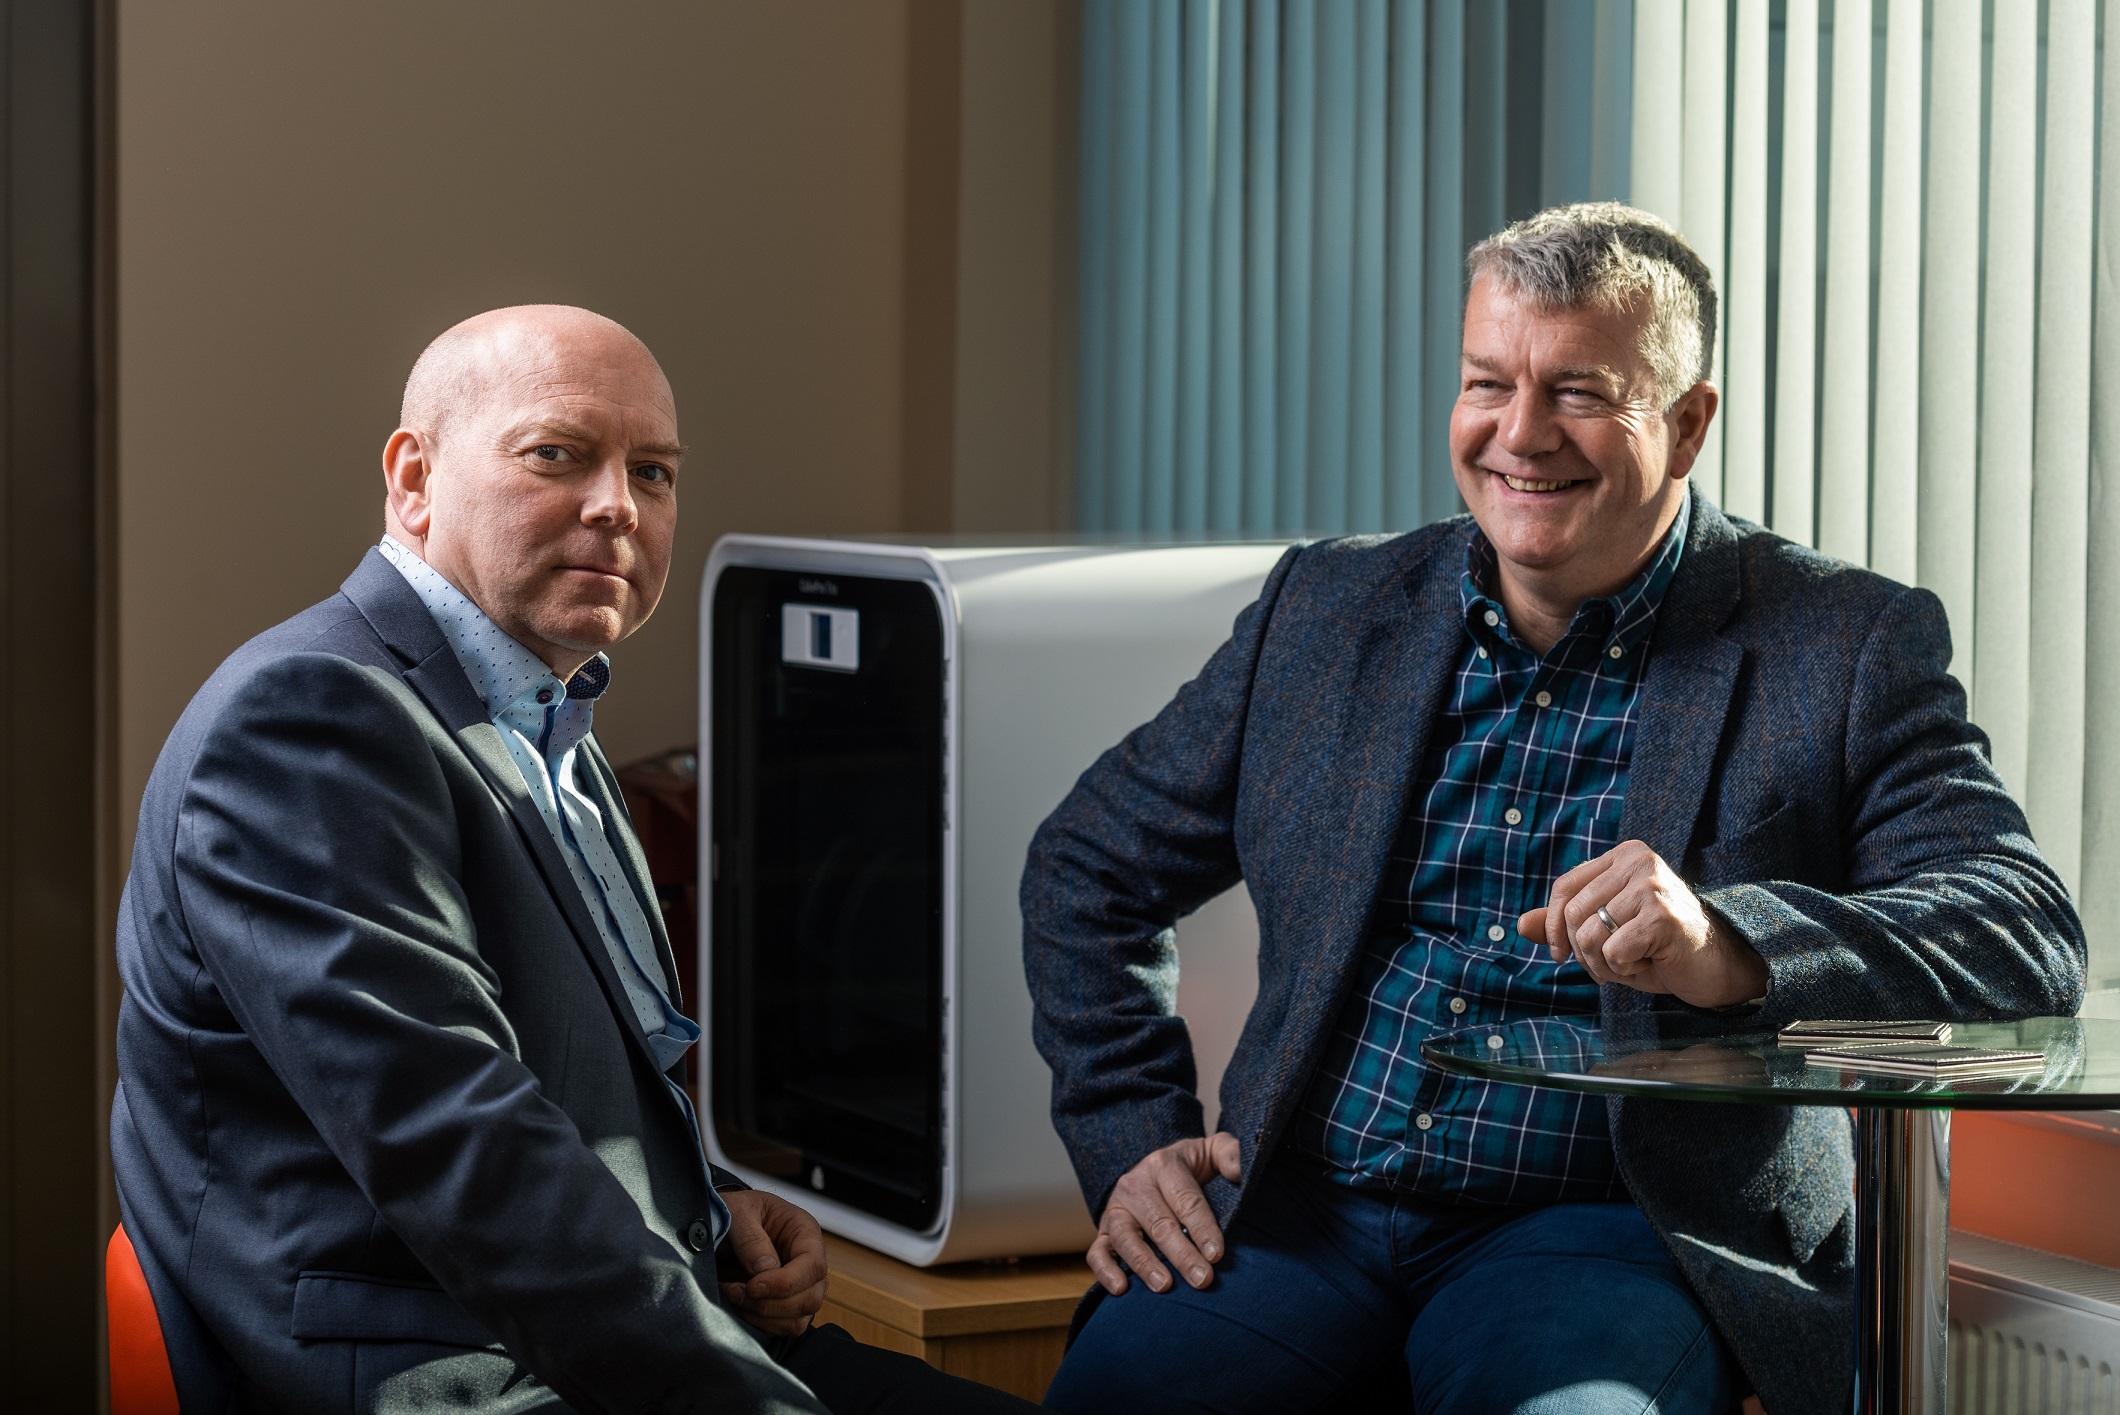 Blackburn Based MGS Launches Newly Developed Branding